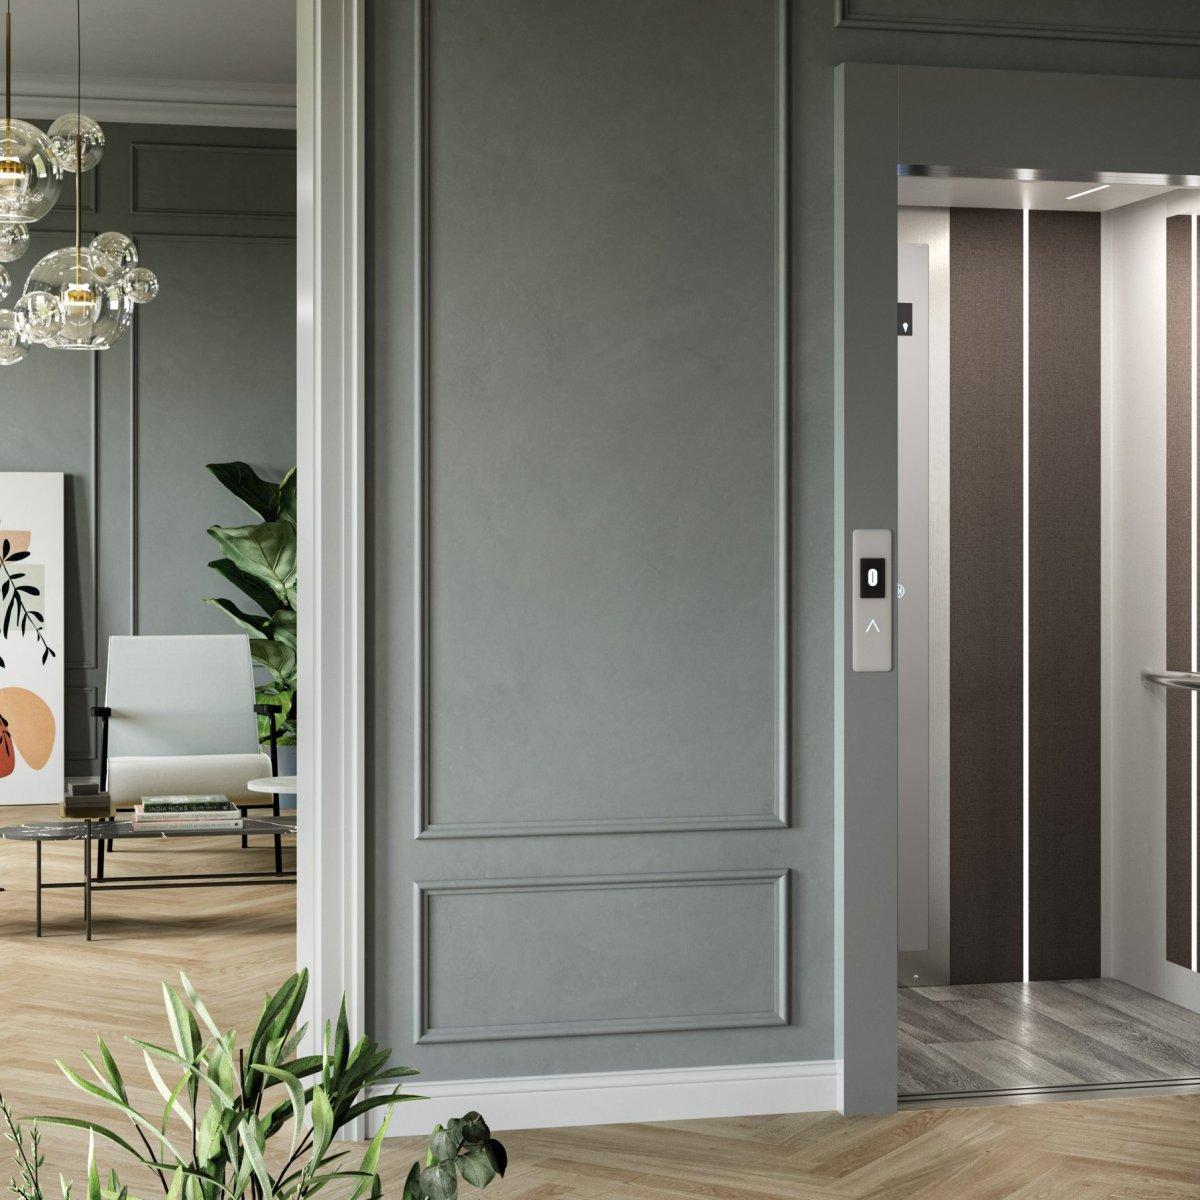 Home Lift | Simplex Elevators Gallery Image 8